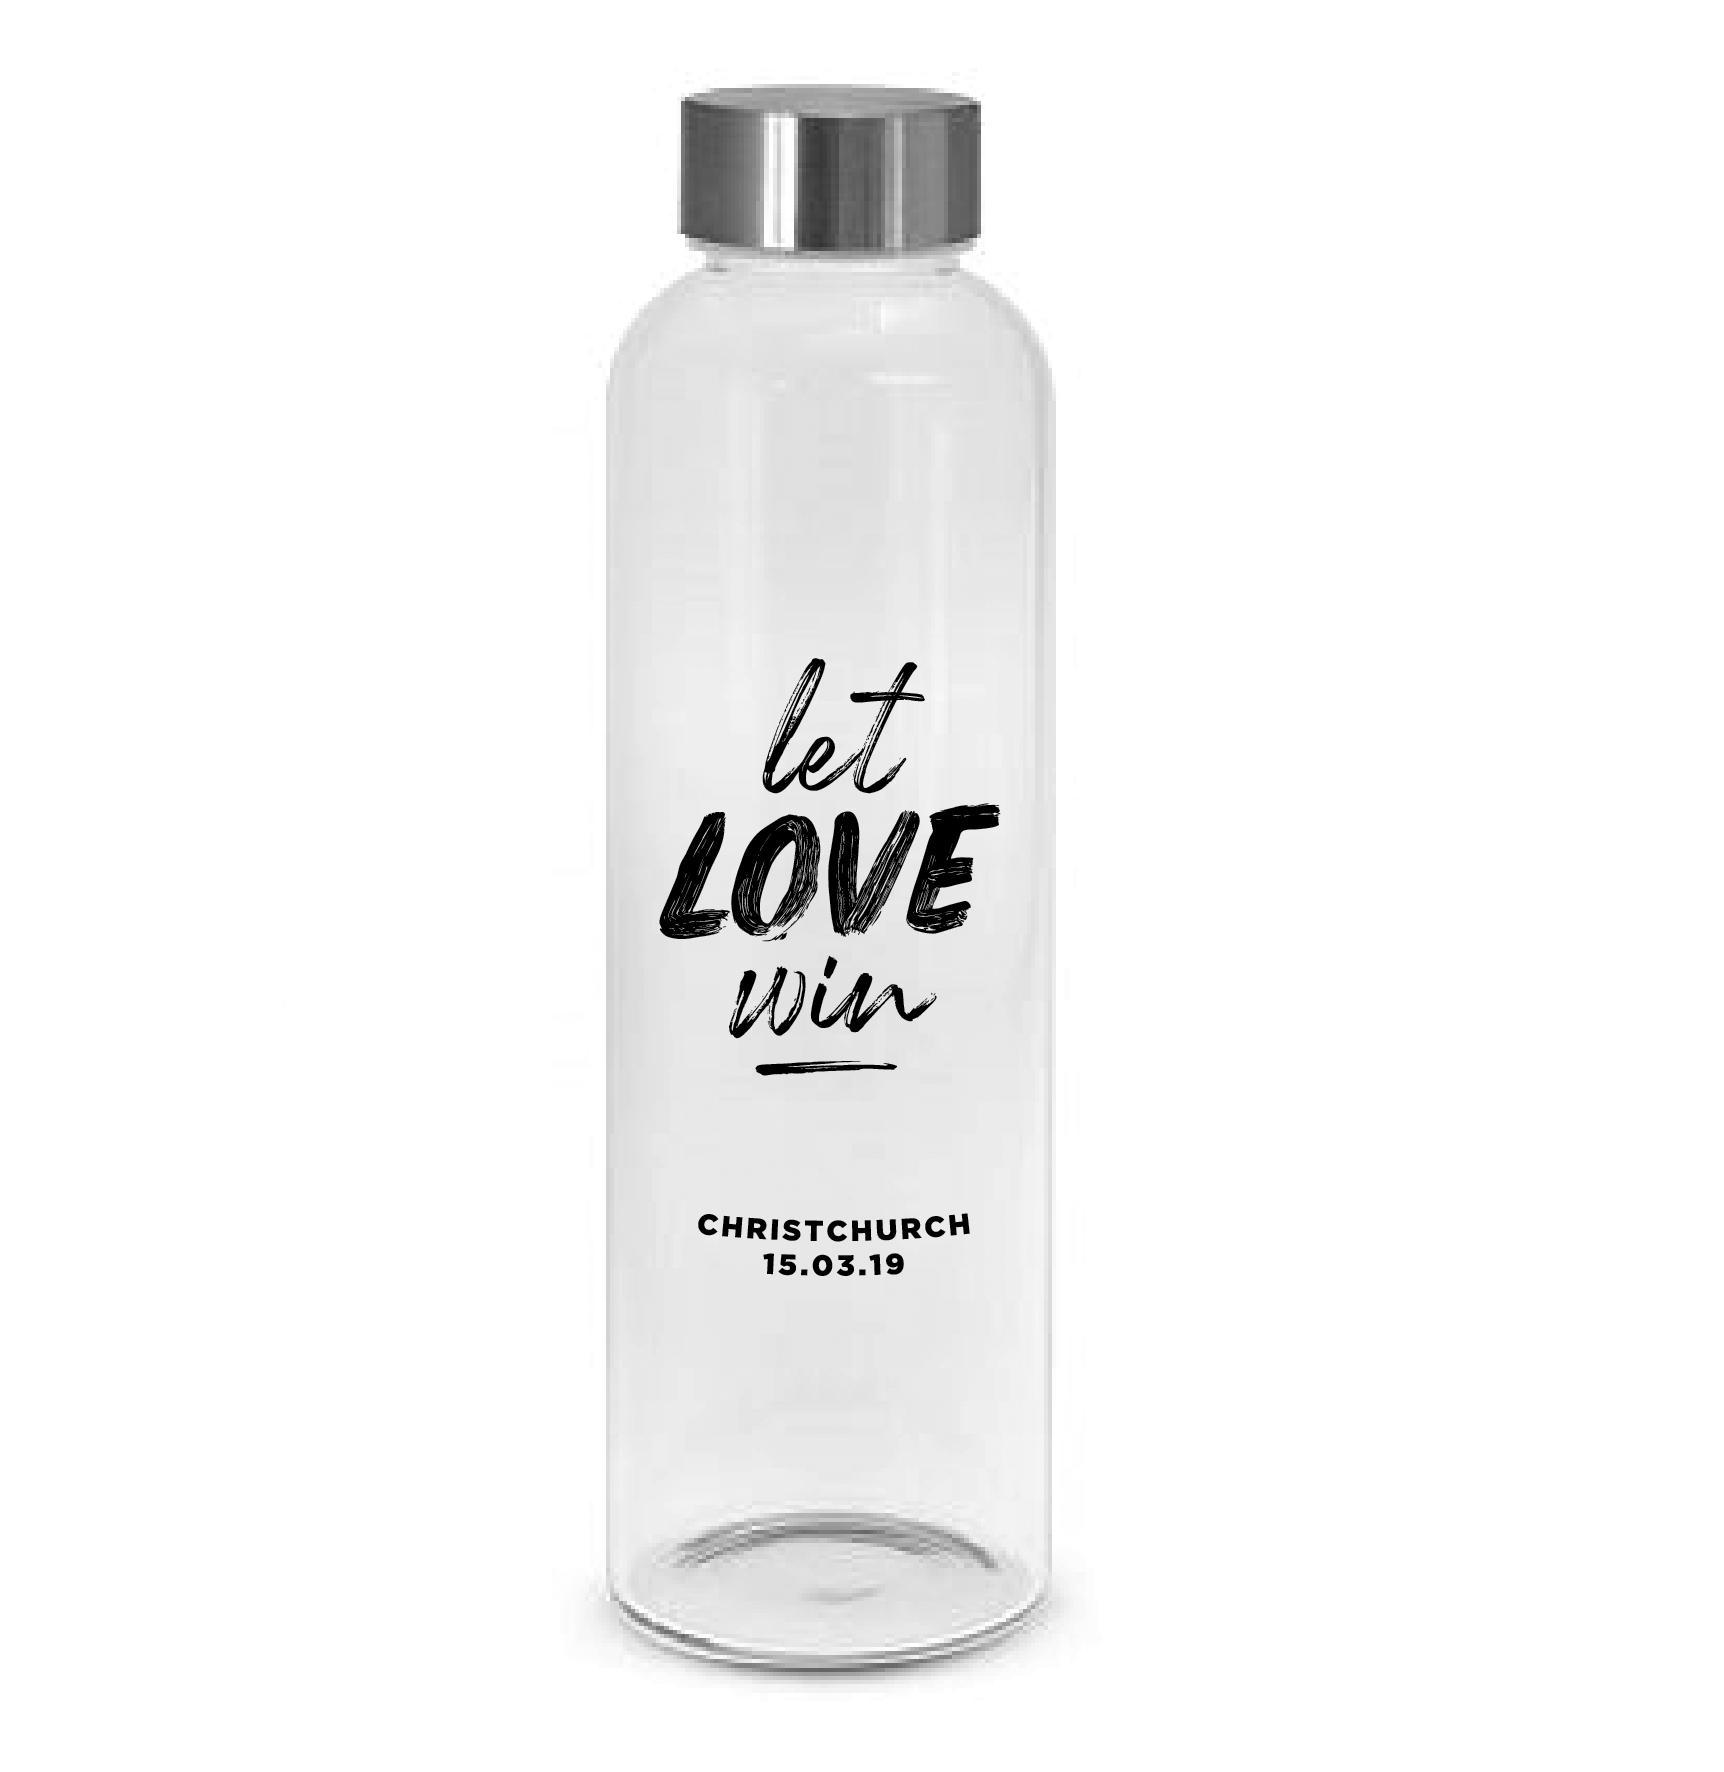 let-love-win-bottle-03.png